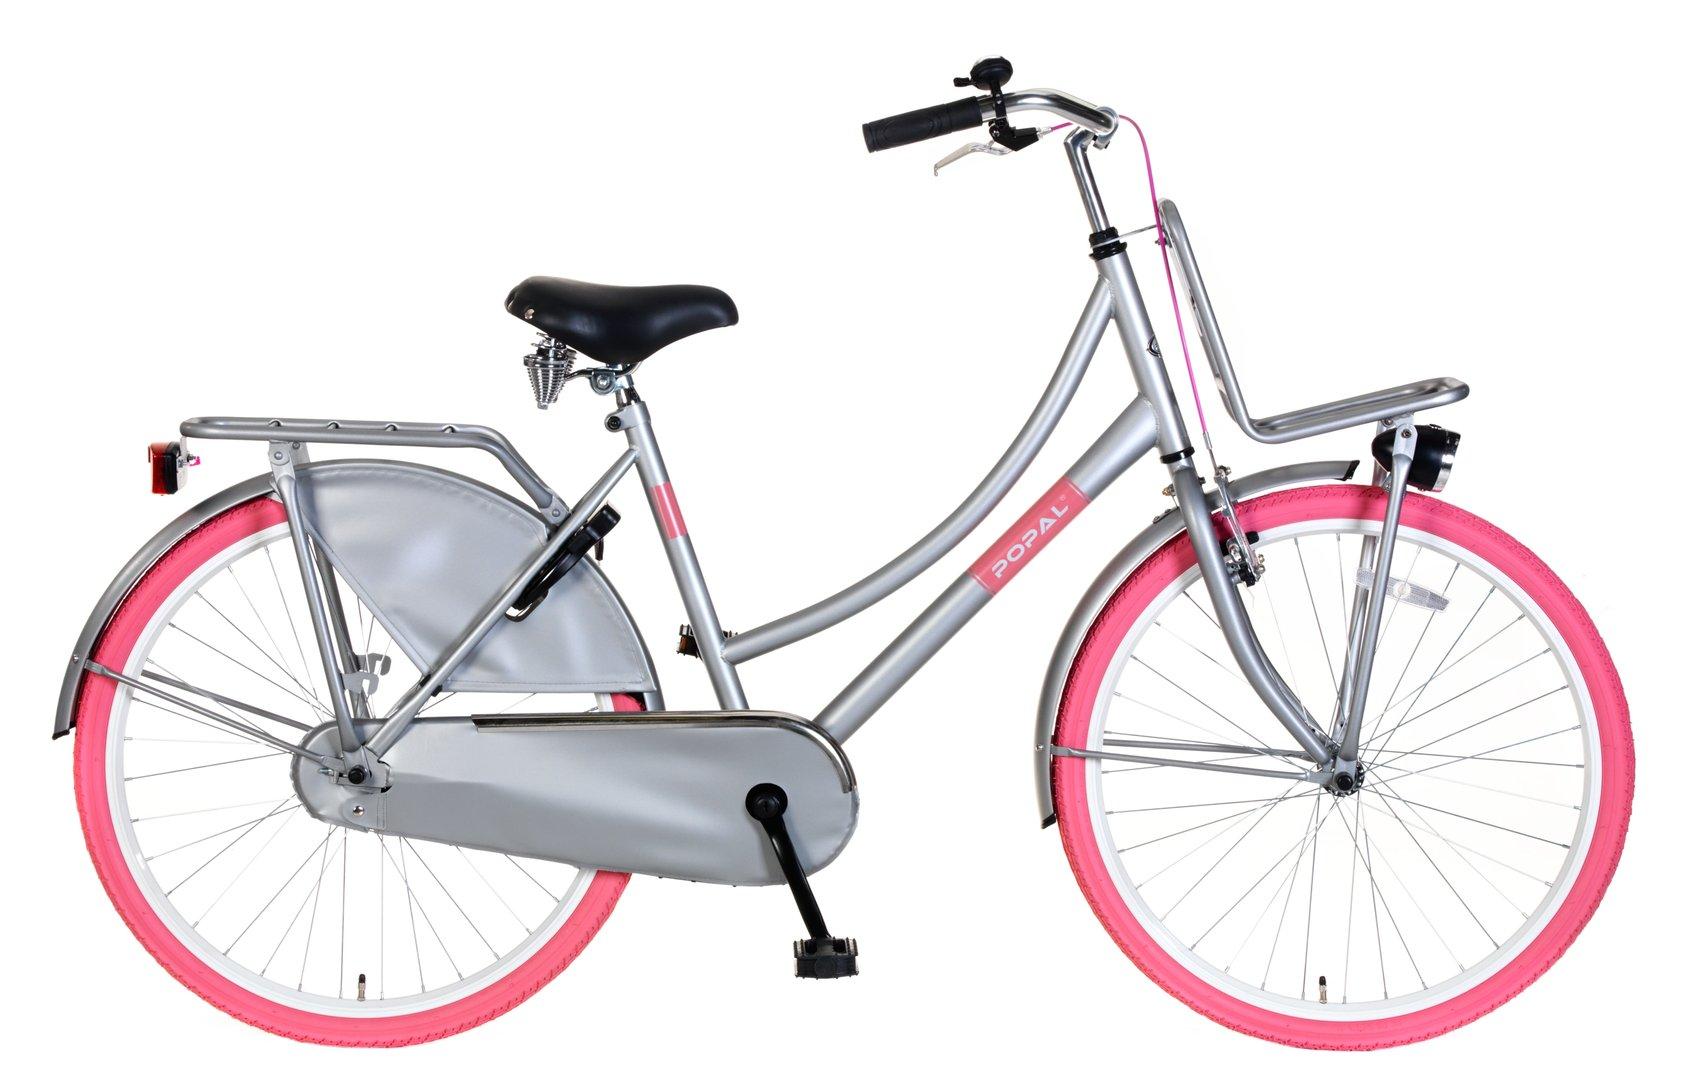 26 zoll hollandrad urban grau pink mit frontr ger. Black Bedroom Furniture Sets. Home Design Ideas